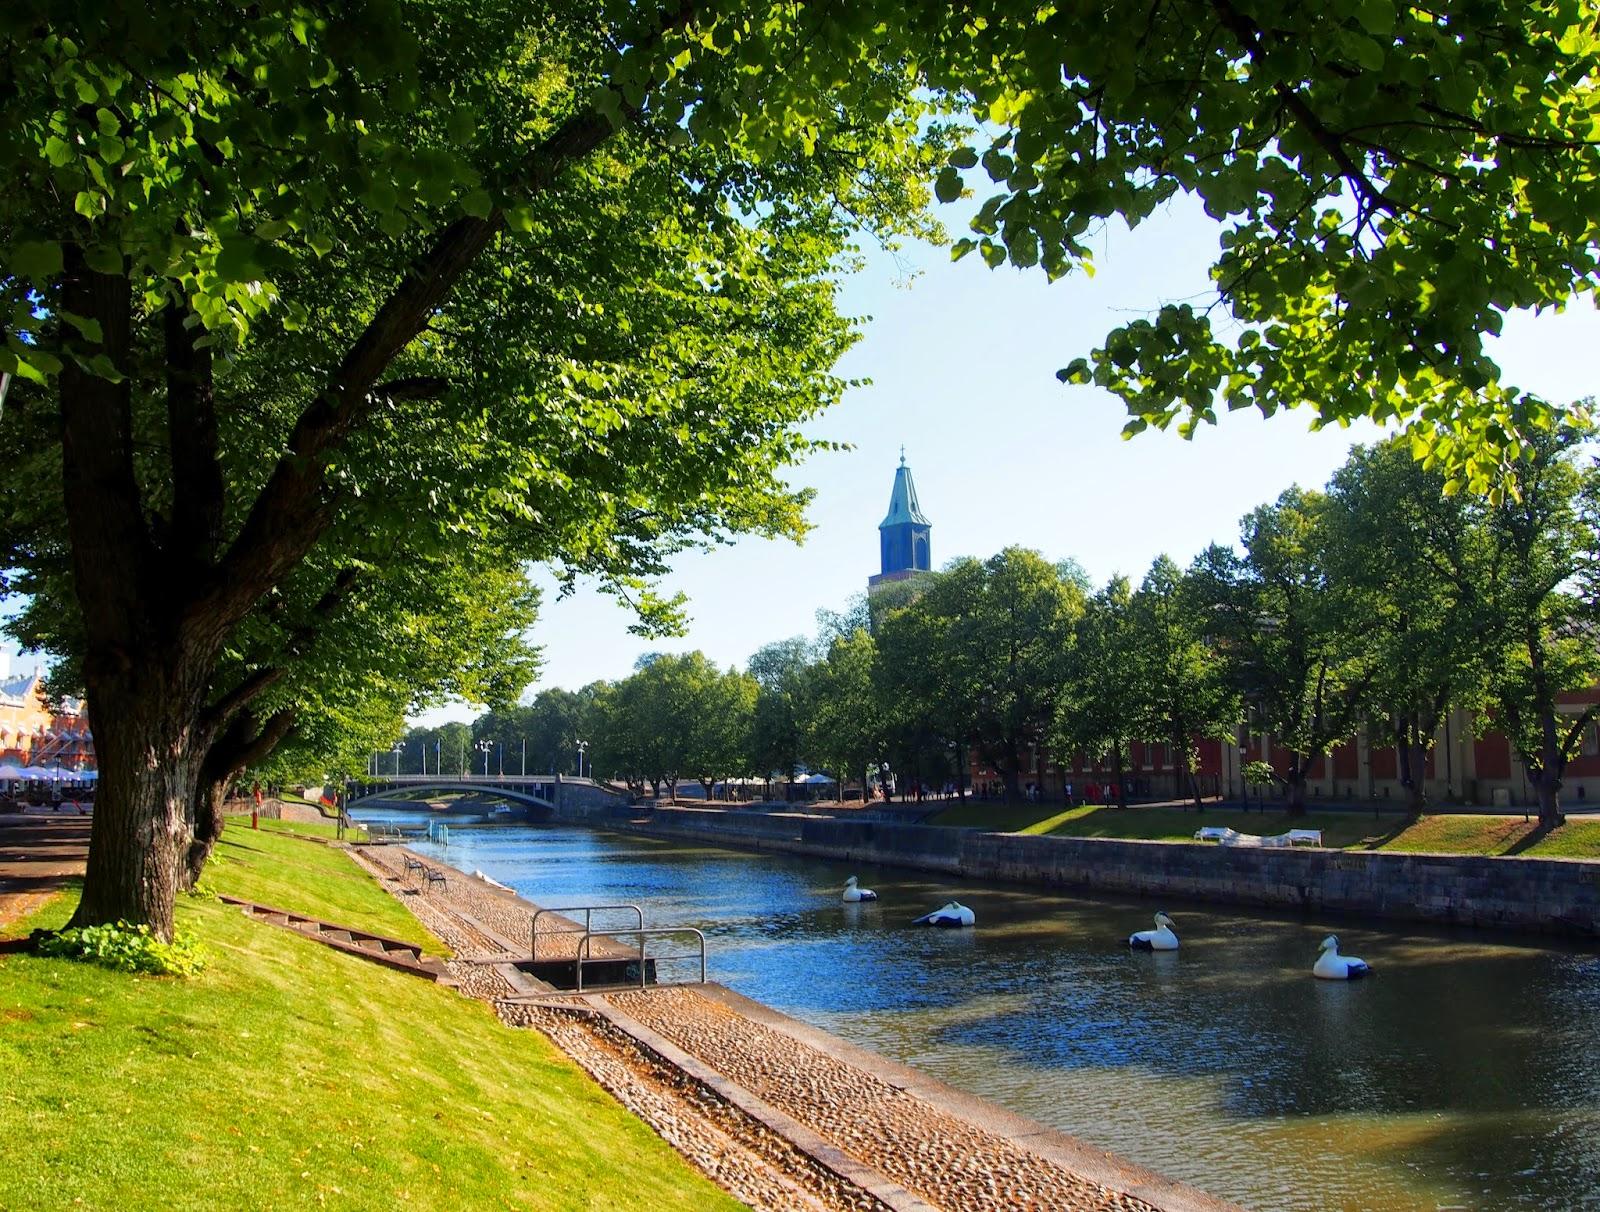 Turku in southern Finland